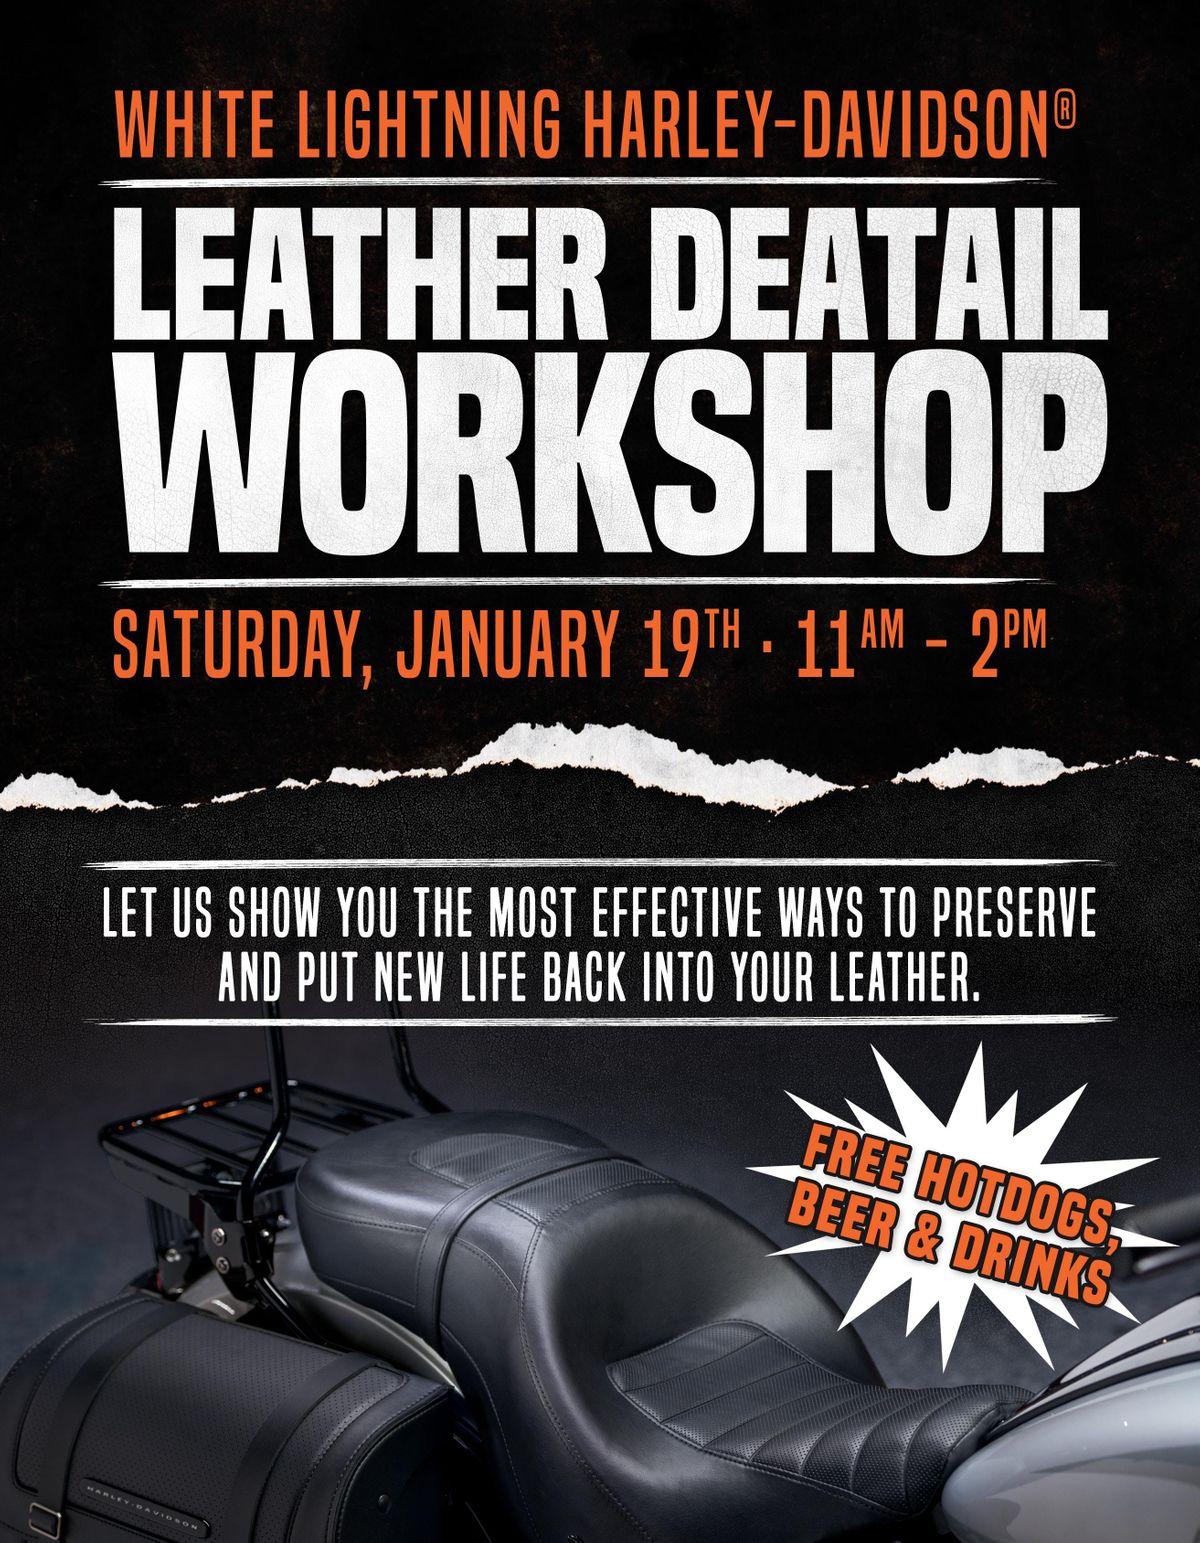 Leather Care Workshop at White Lightning Harley-Davidson, Chattanooga